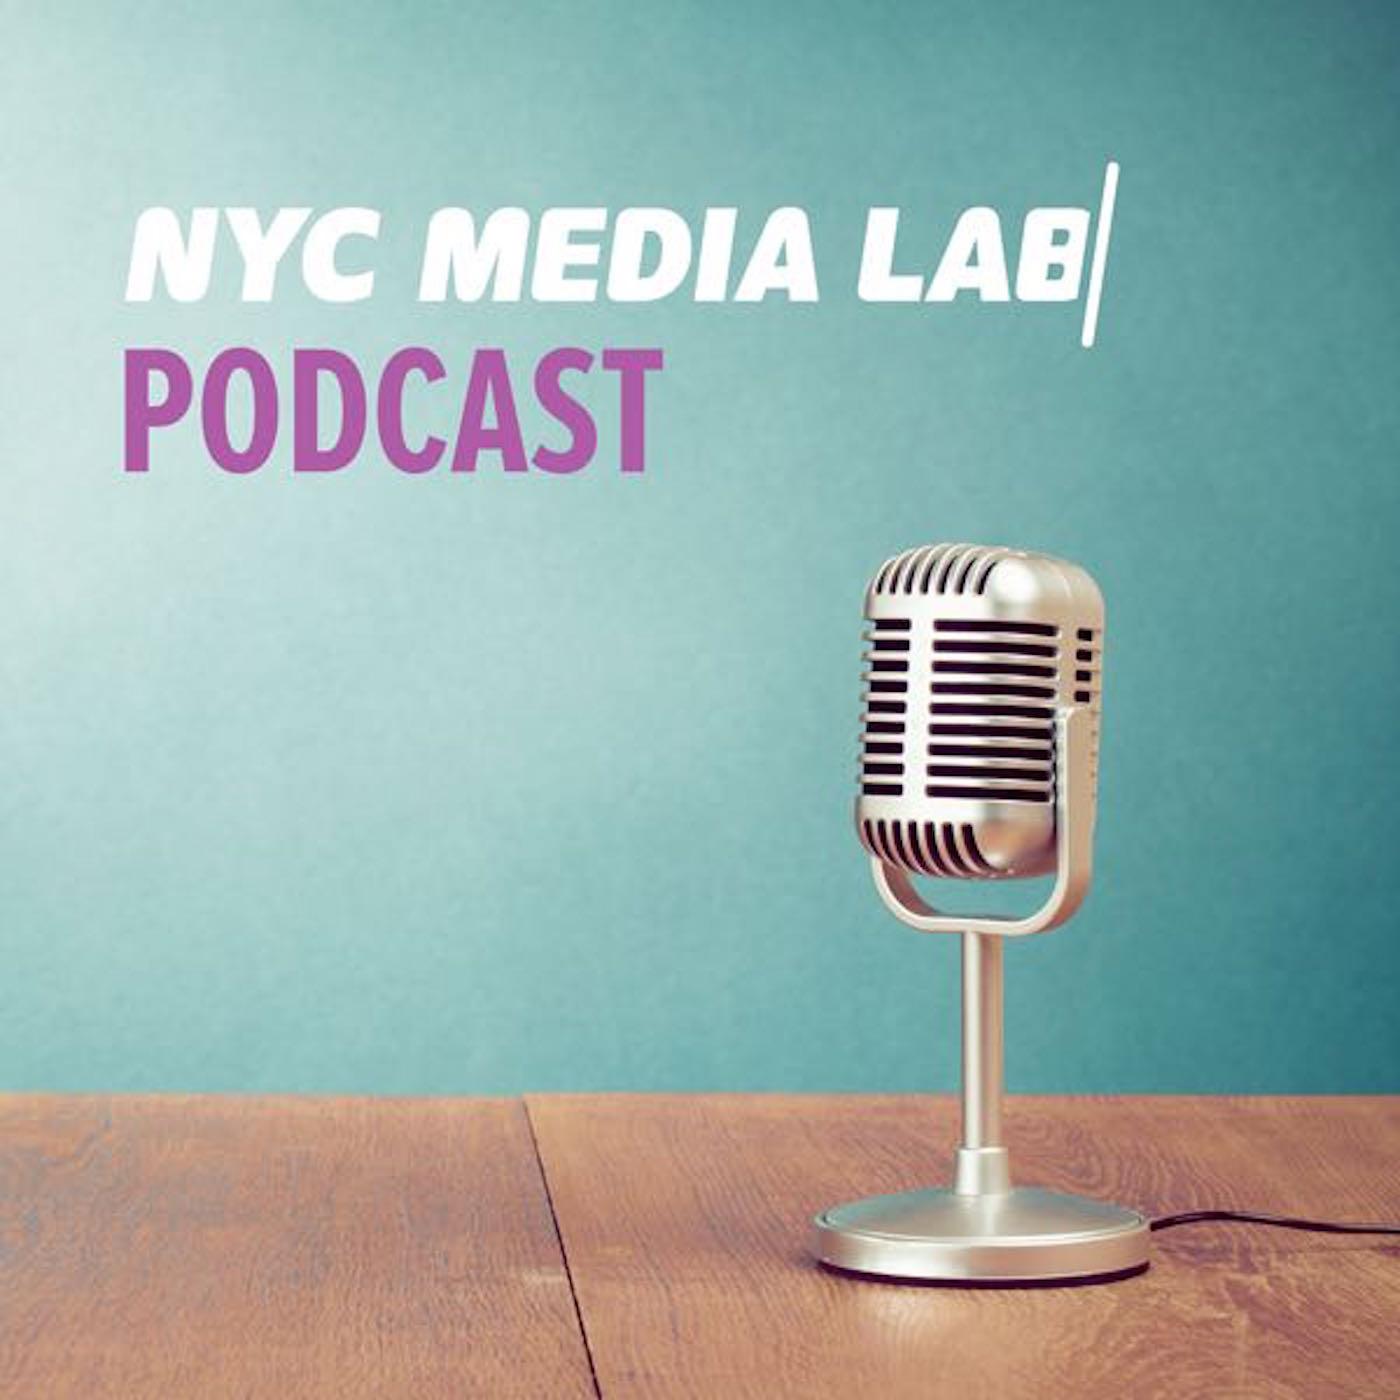 NYC Media Lab Podcast